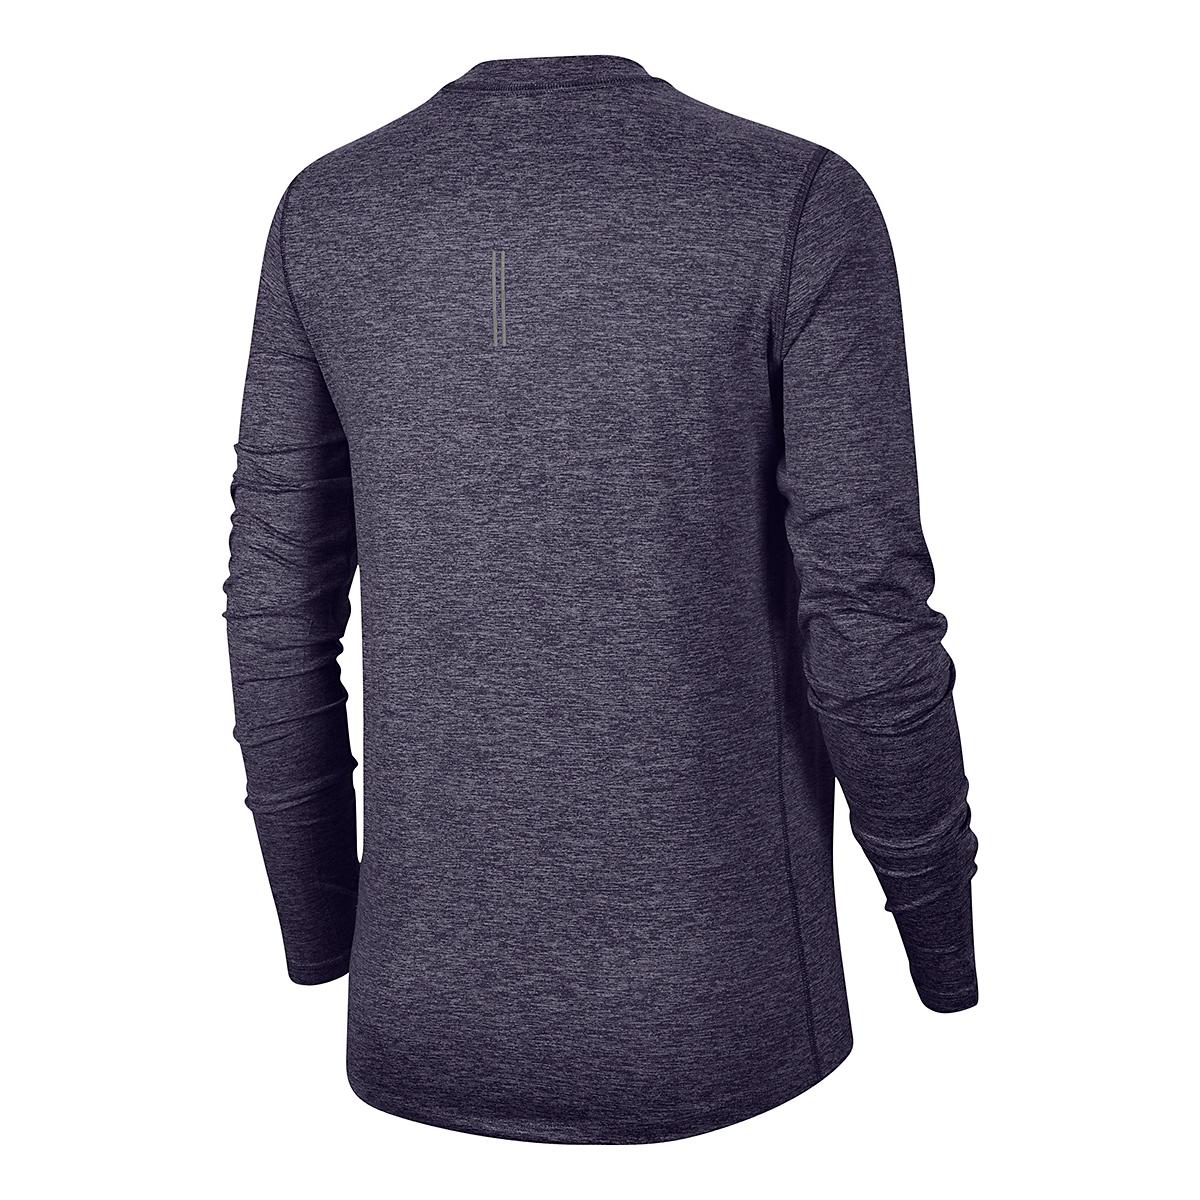 Women's Nike Element Crew Long Sleeve - Color: Dark Raisin/Light Violet/Reflective Silver - Size: XS, Dark Raisin/Light Violet/Reflective Silver, large, image 4